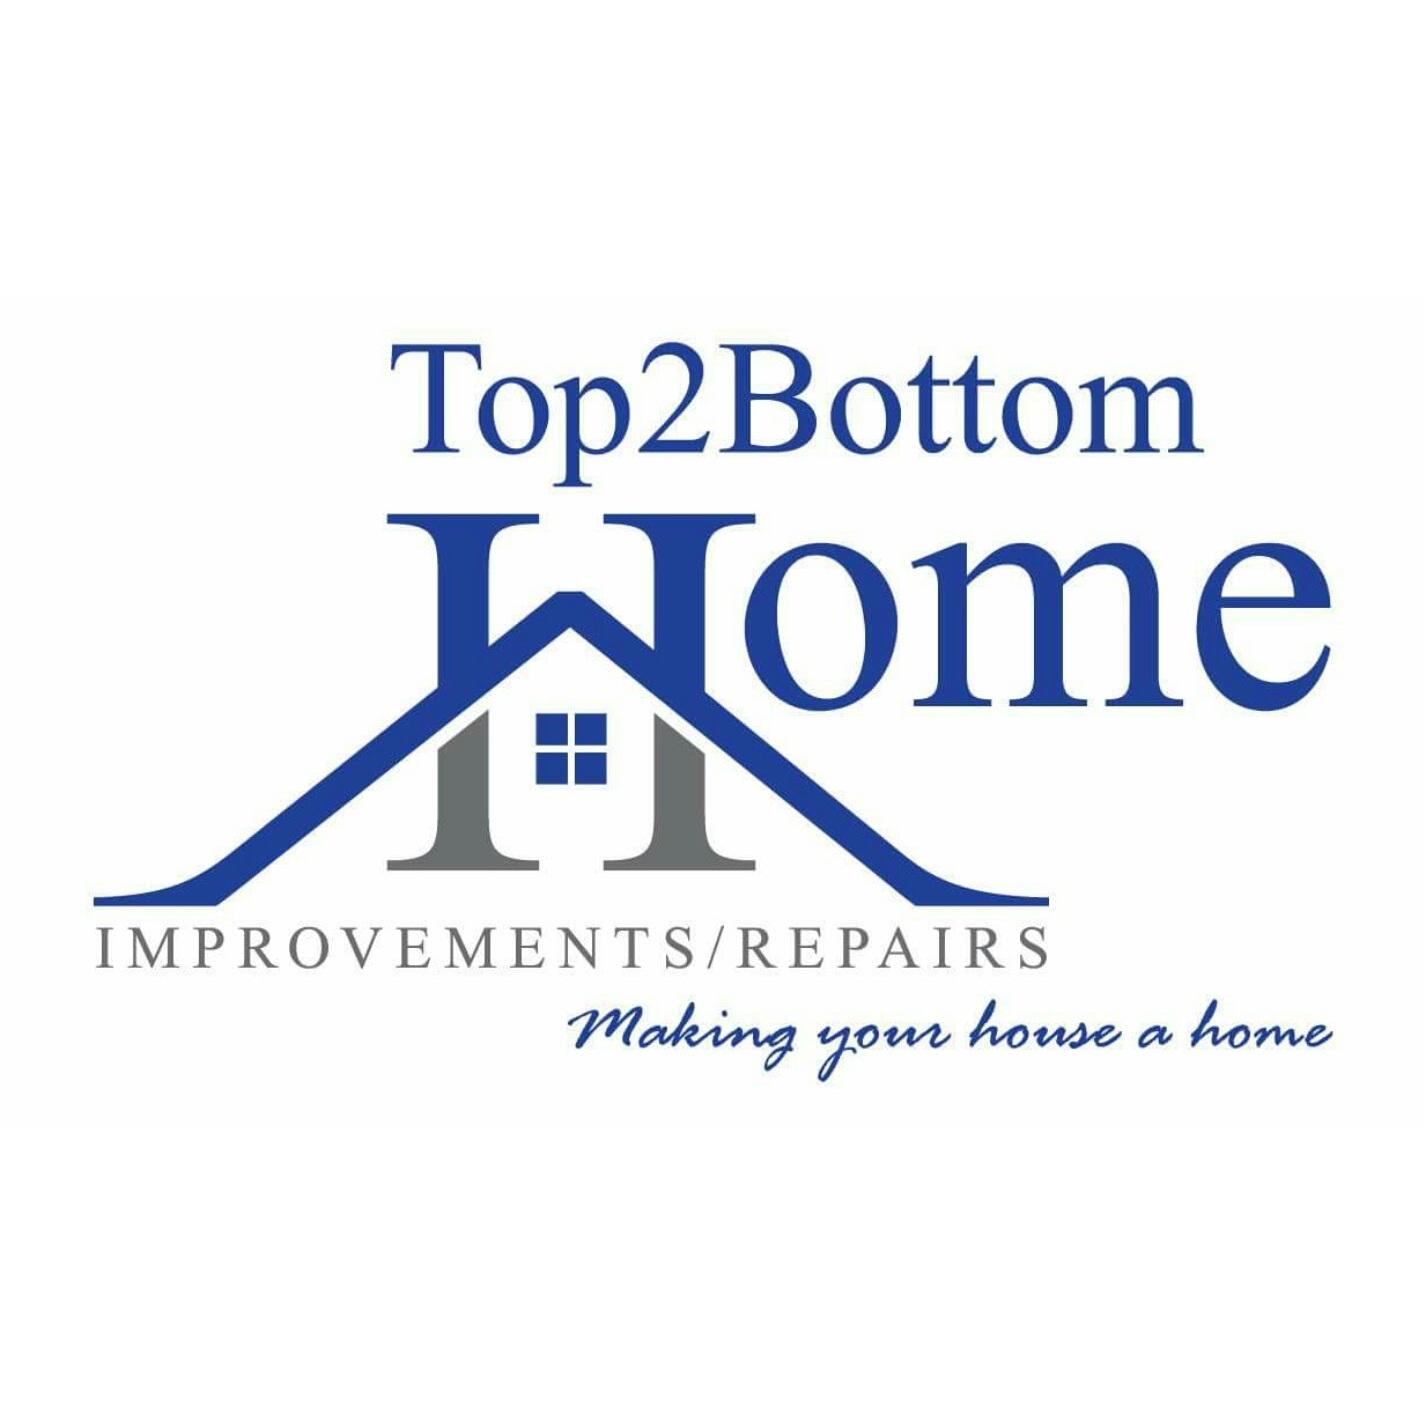 Top 2 Bottom Home Improvements Logo